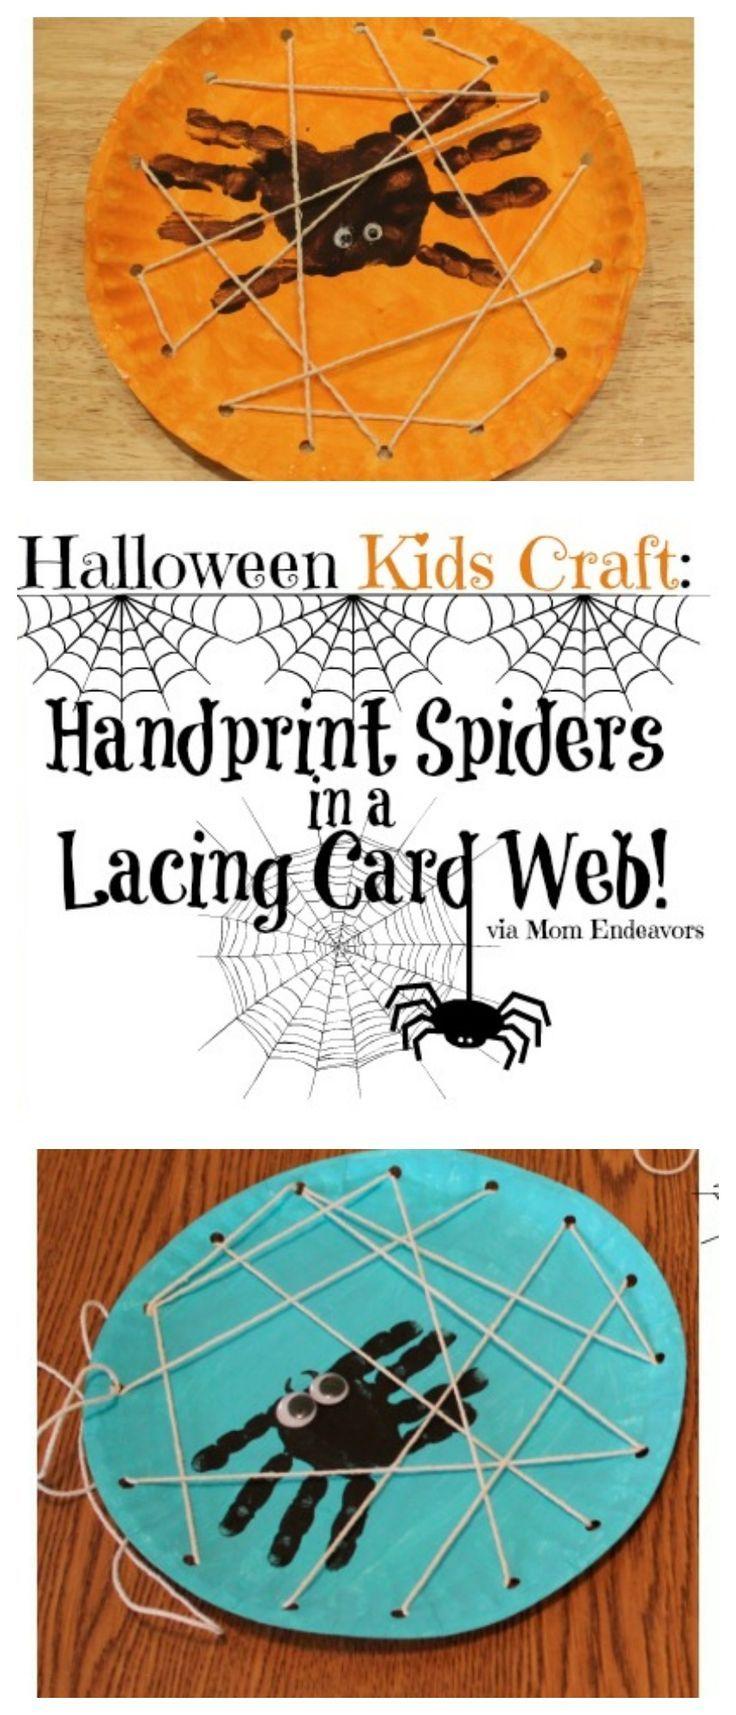 Halloween Kids Craft: Handprint Spiders in a DIY Lacing Card Web via momendeavors.com